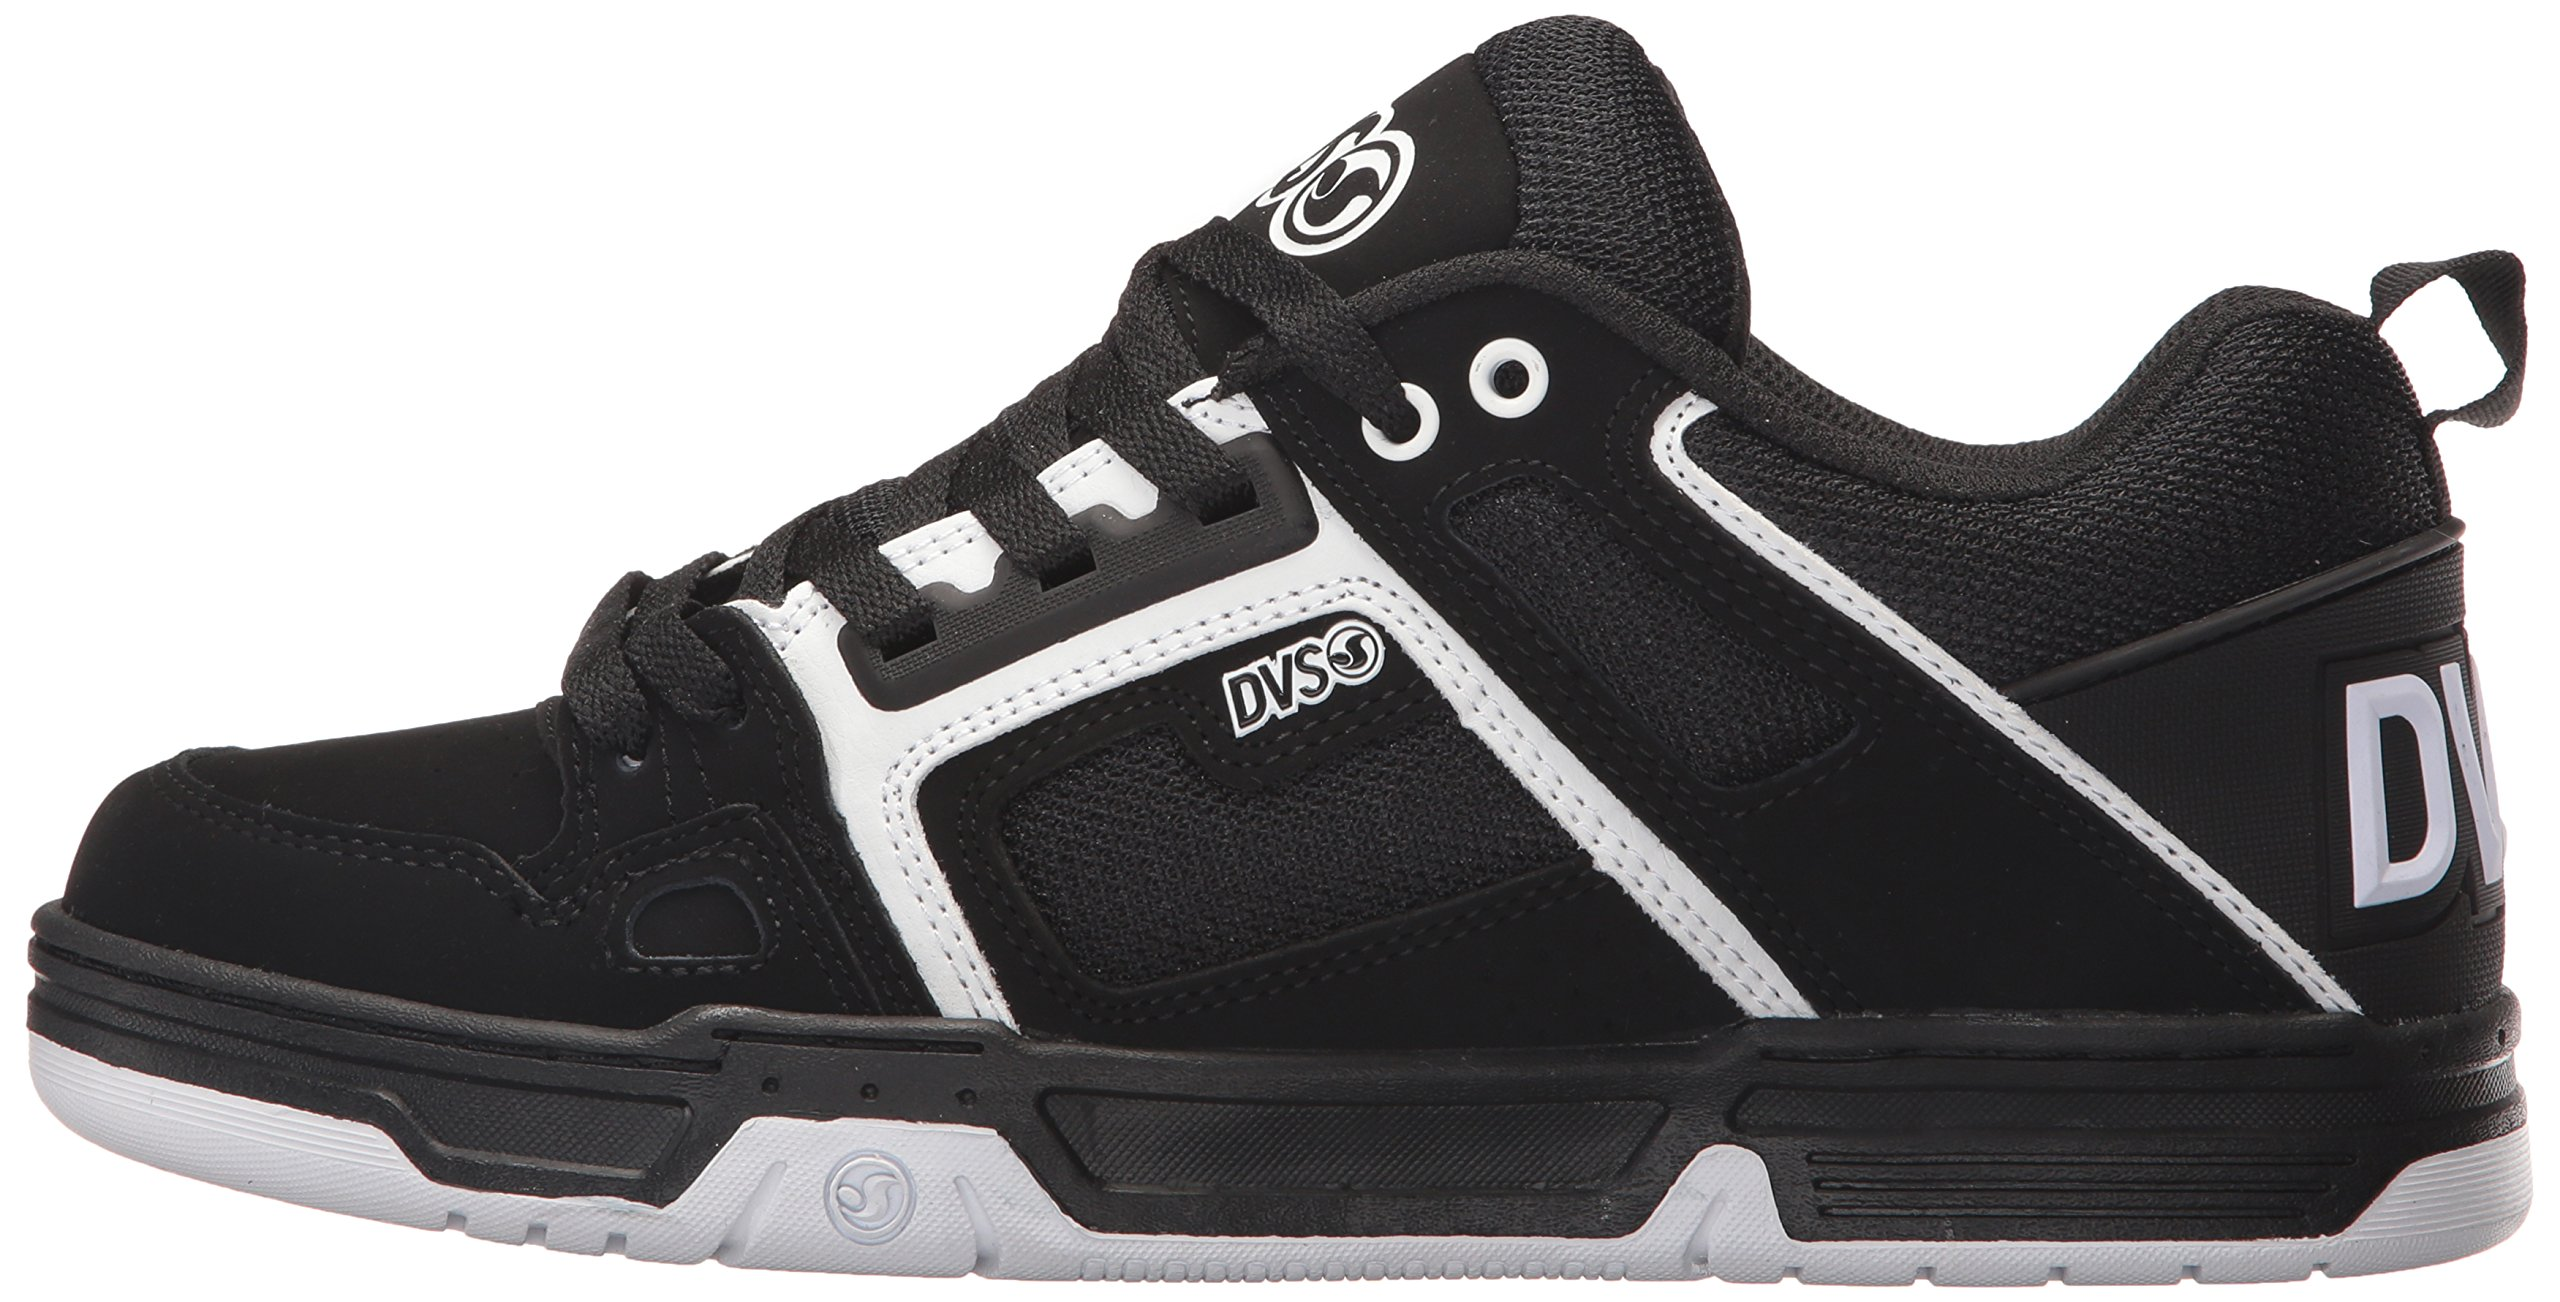 DVS Men's Comanche Skate Shoe, Black/White Nubuck, 12 Medium US by DVS (Image #5)